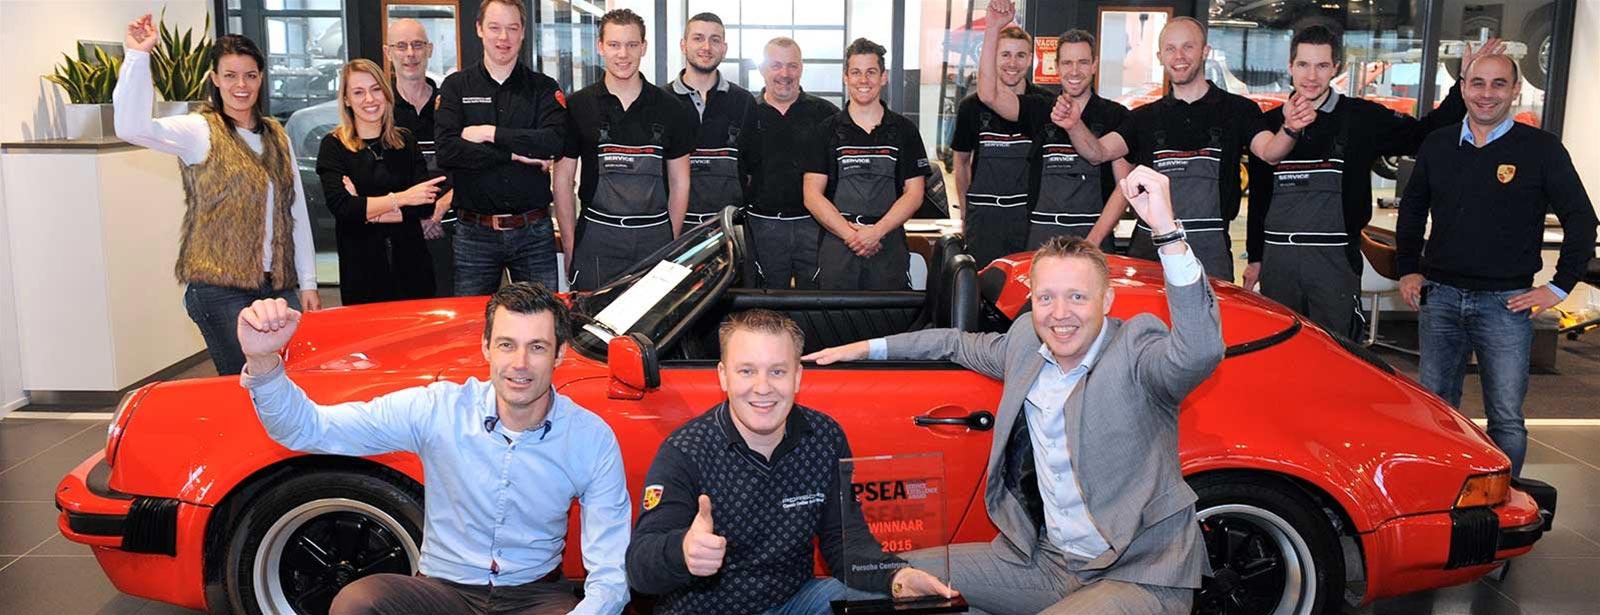 Porsche Service Classic Award. - Trotse winnaar 2015.